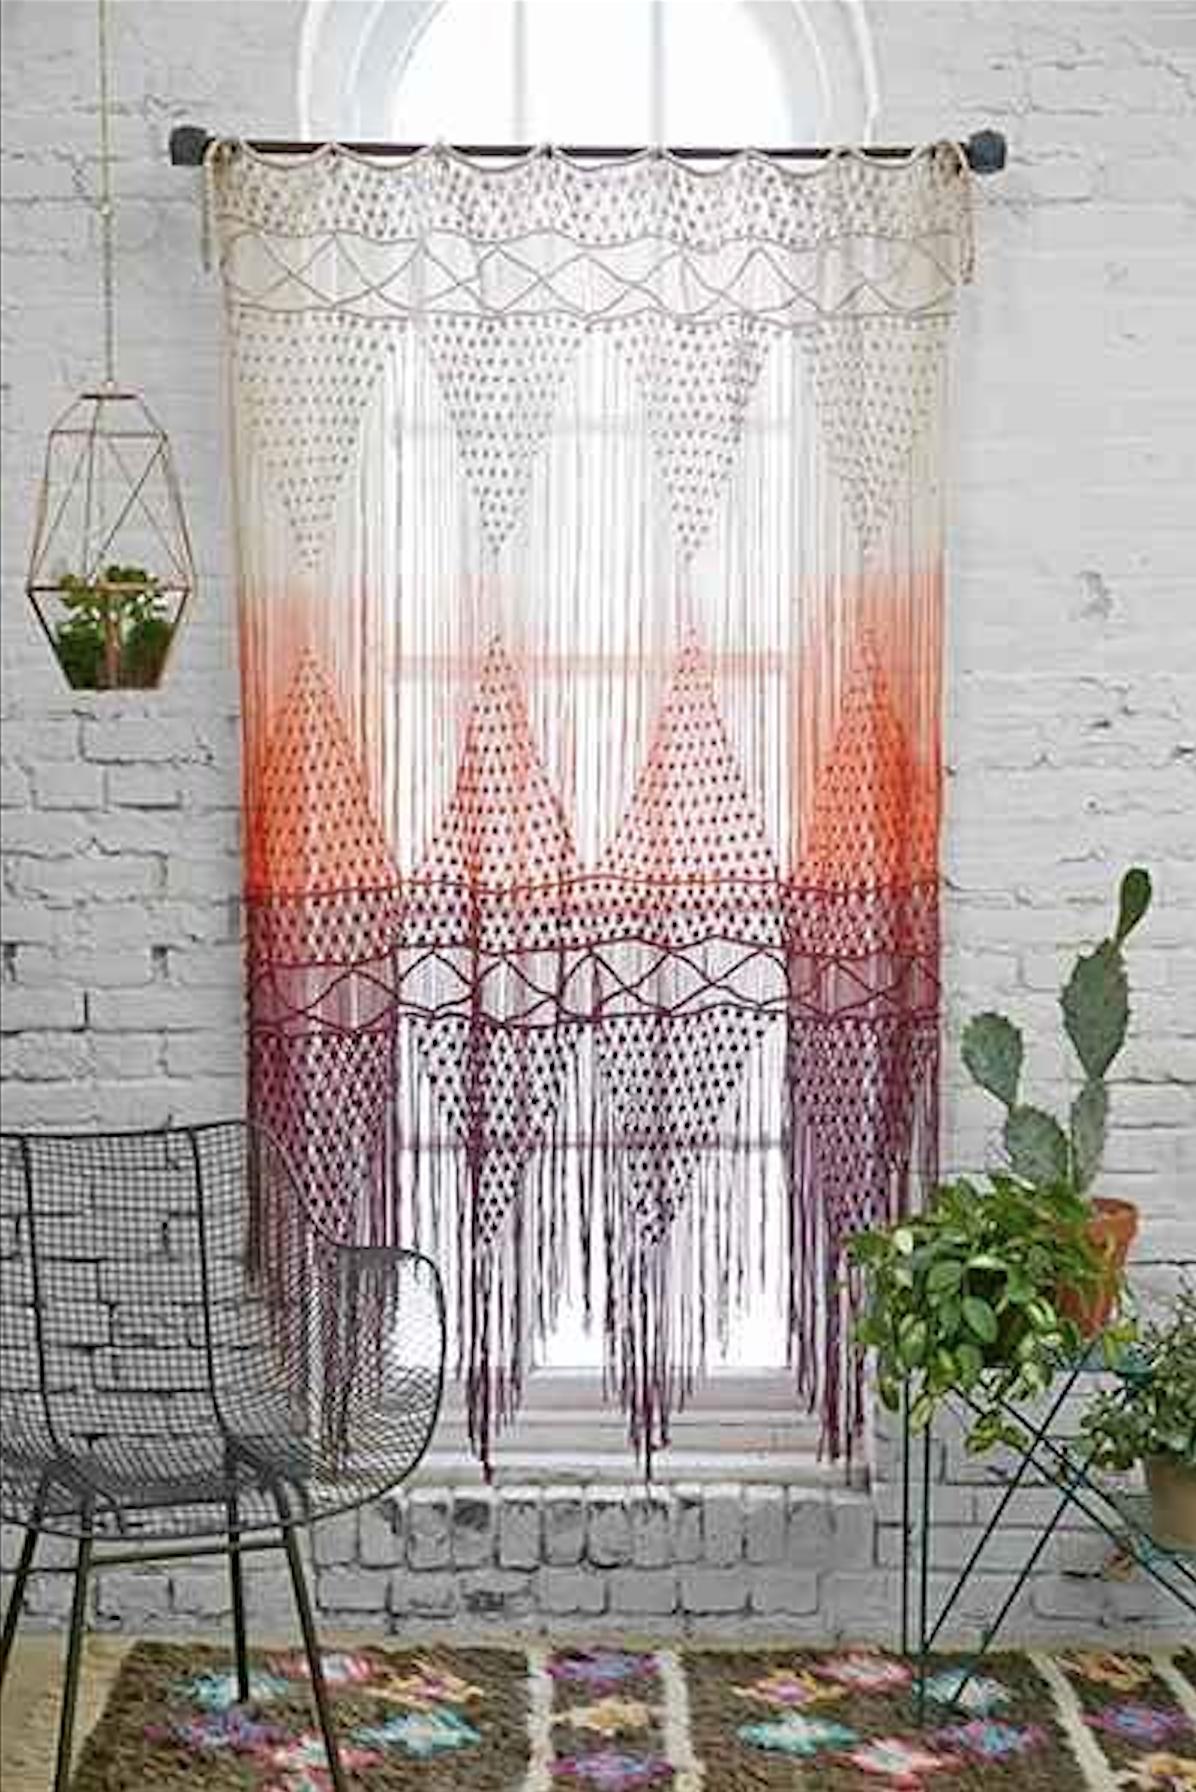 Der hippiestil der wieder voll im trend ist sweet home - Makramee wandbehang ...